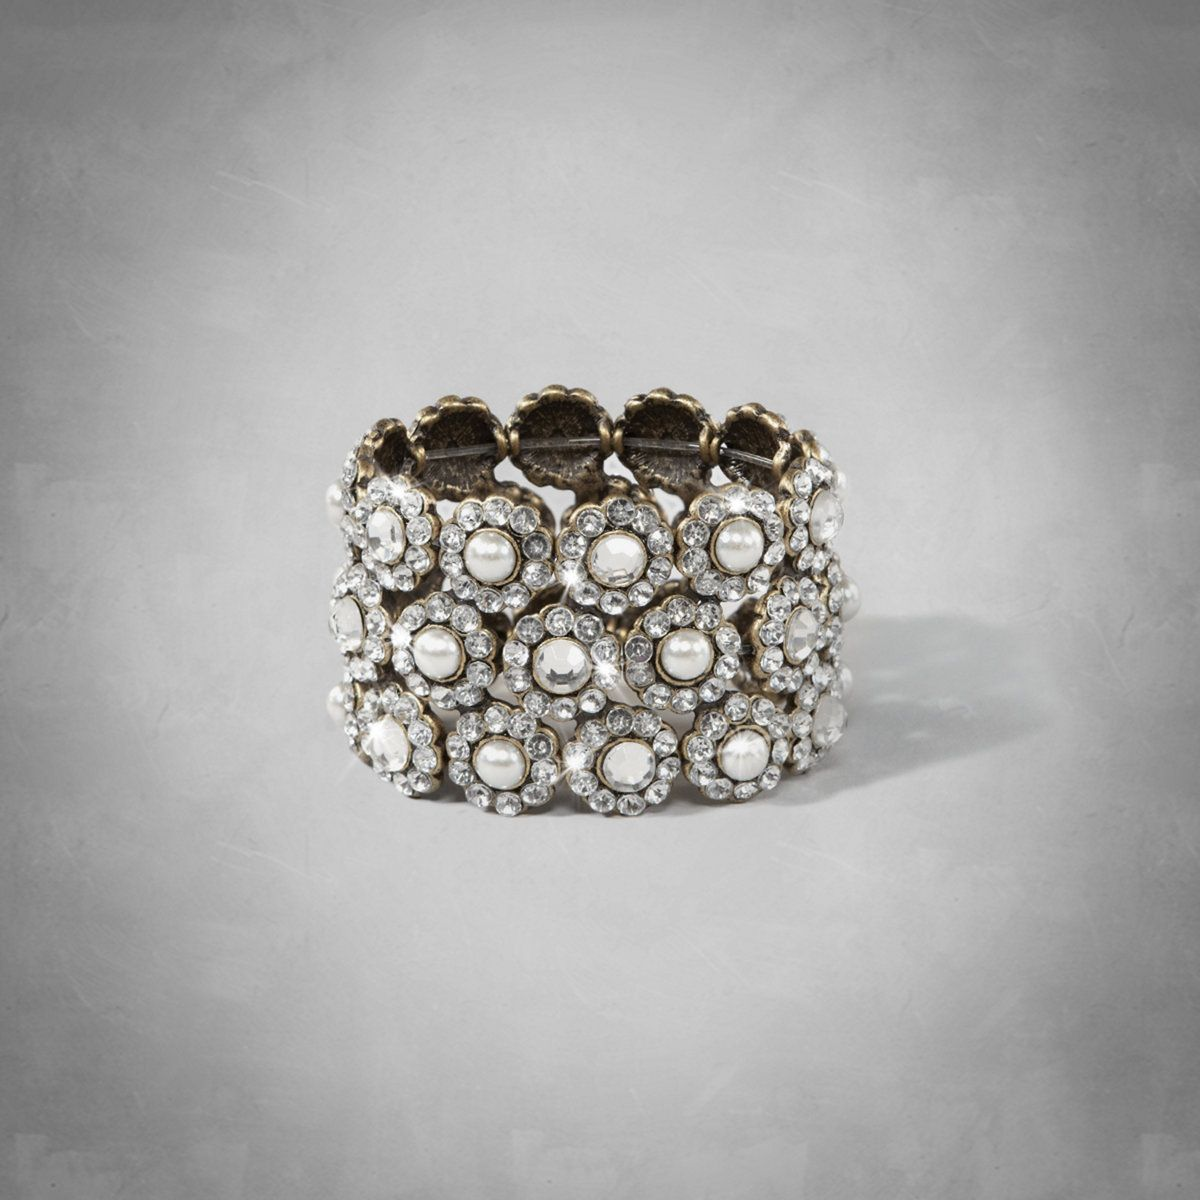 Womens Shine Stretch Cuff Bracelet | Womens Accessories | eu.Abercrombie.com